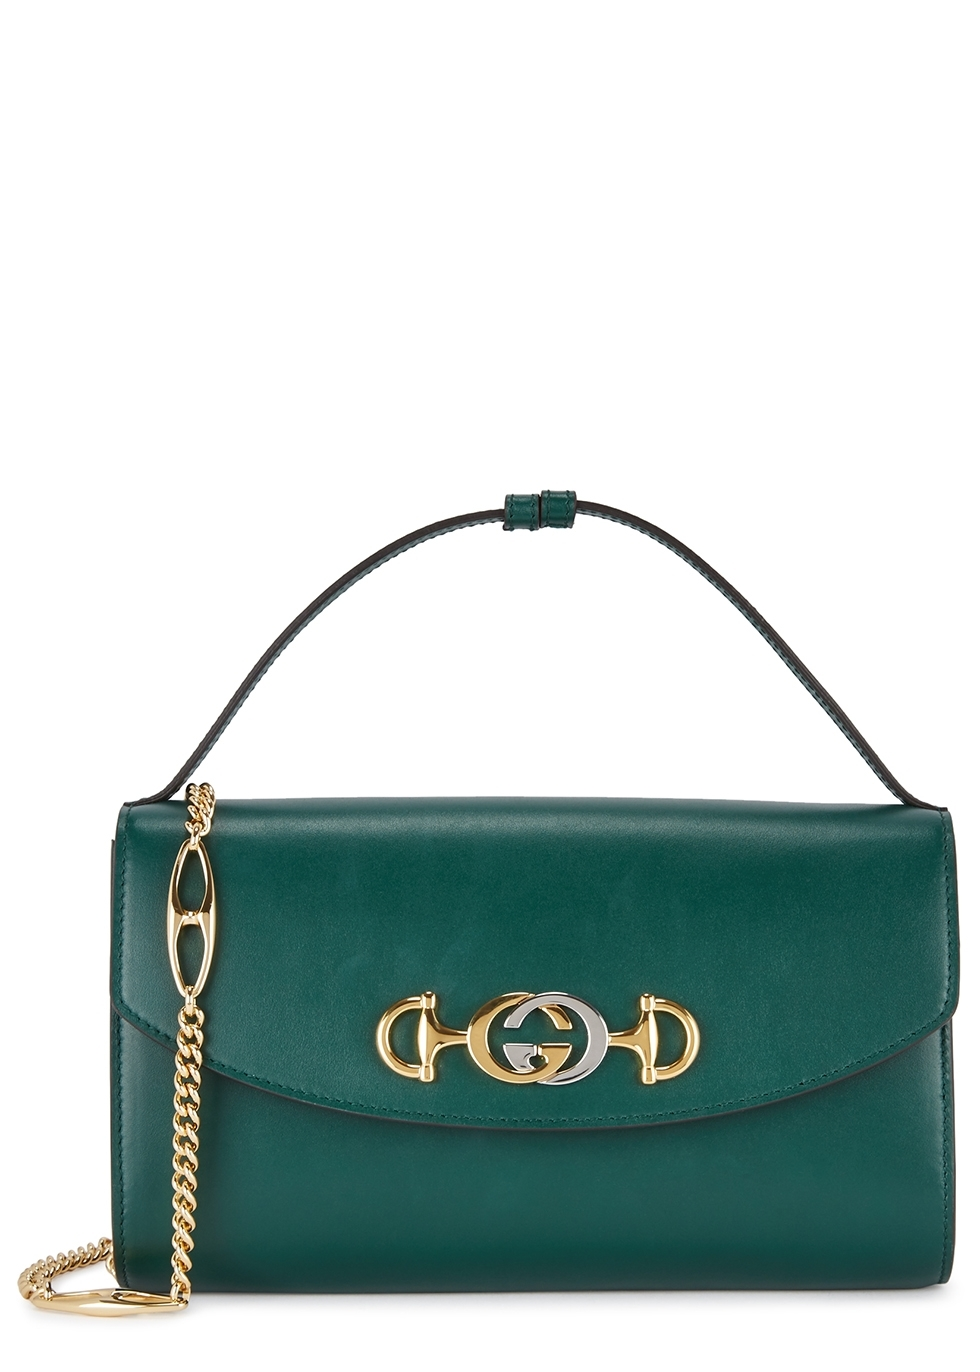 19f64d8be17f Women s Designer Bags